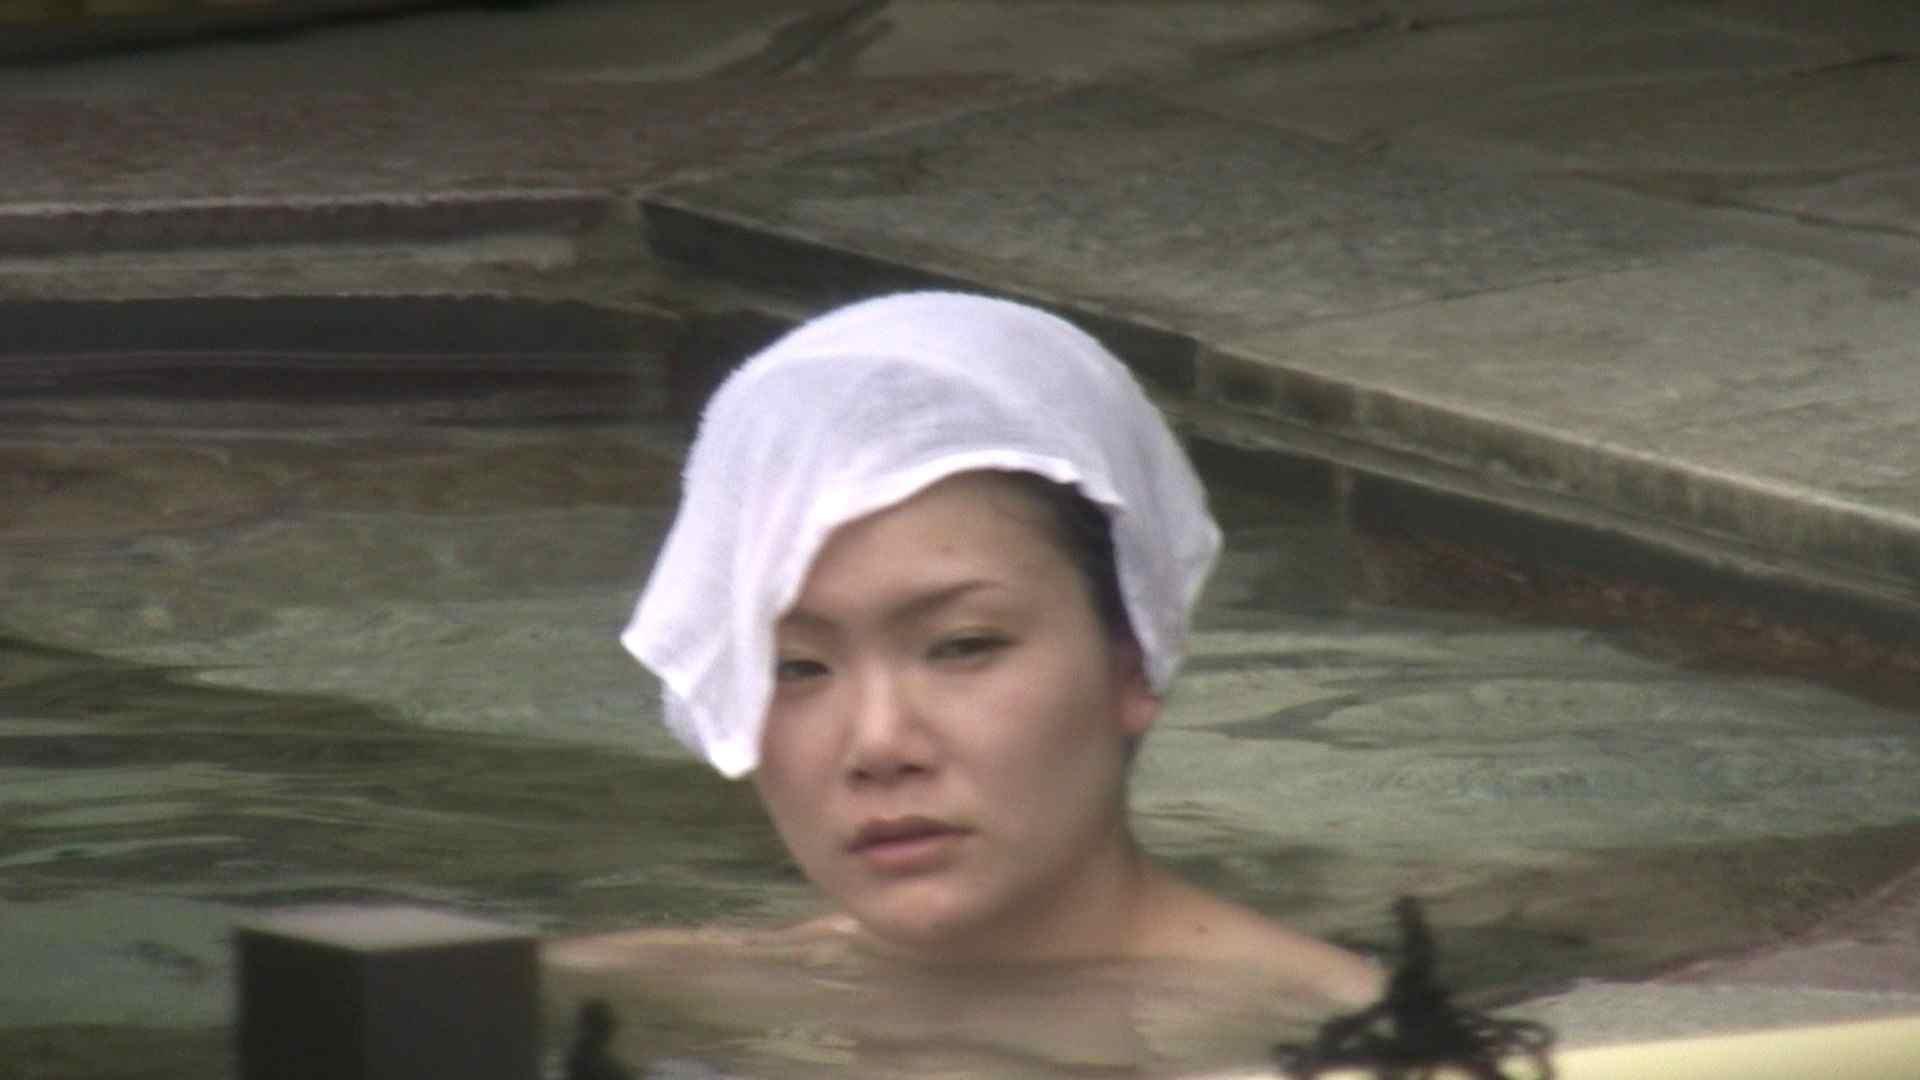 Aquaな露天風呂Vol.12【VIP】 HなOL | 盗撮  83pic 80